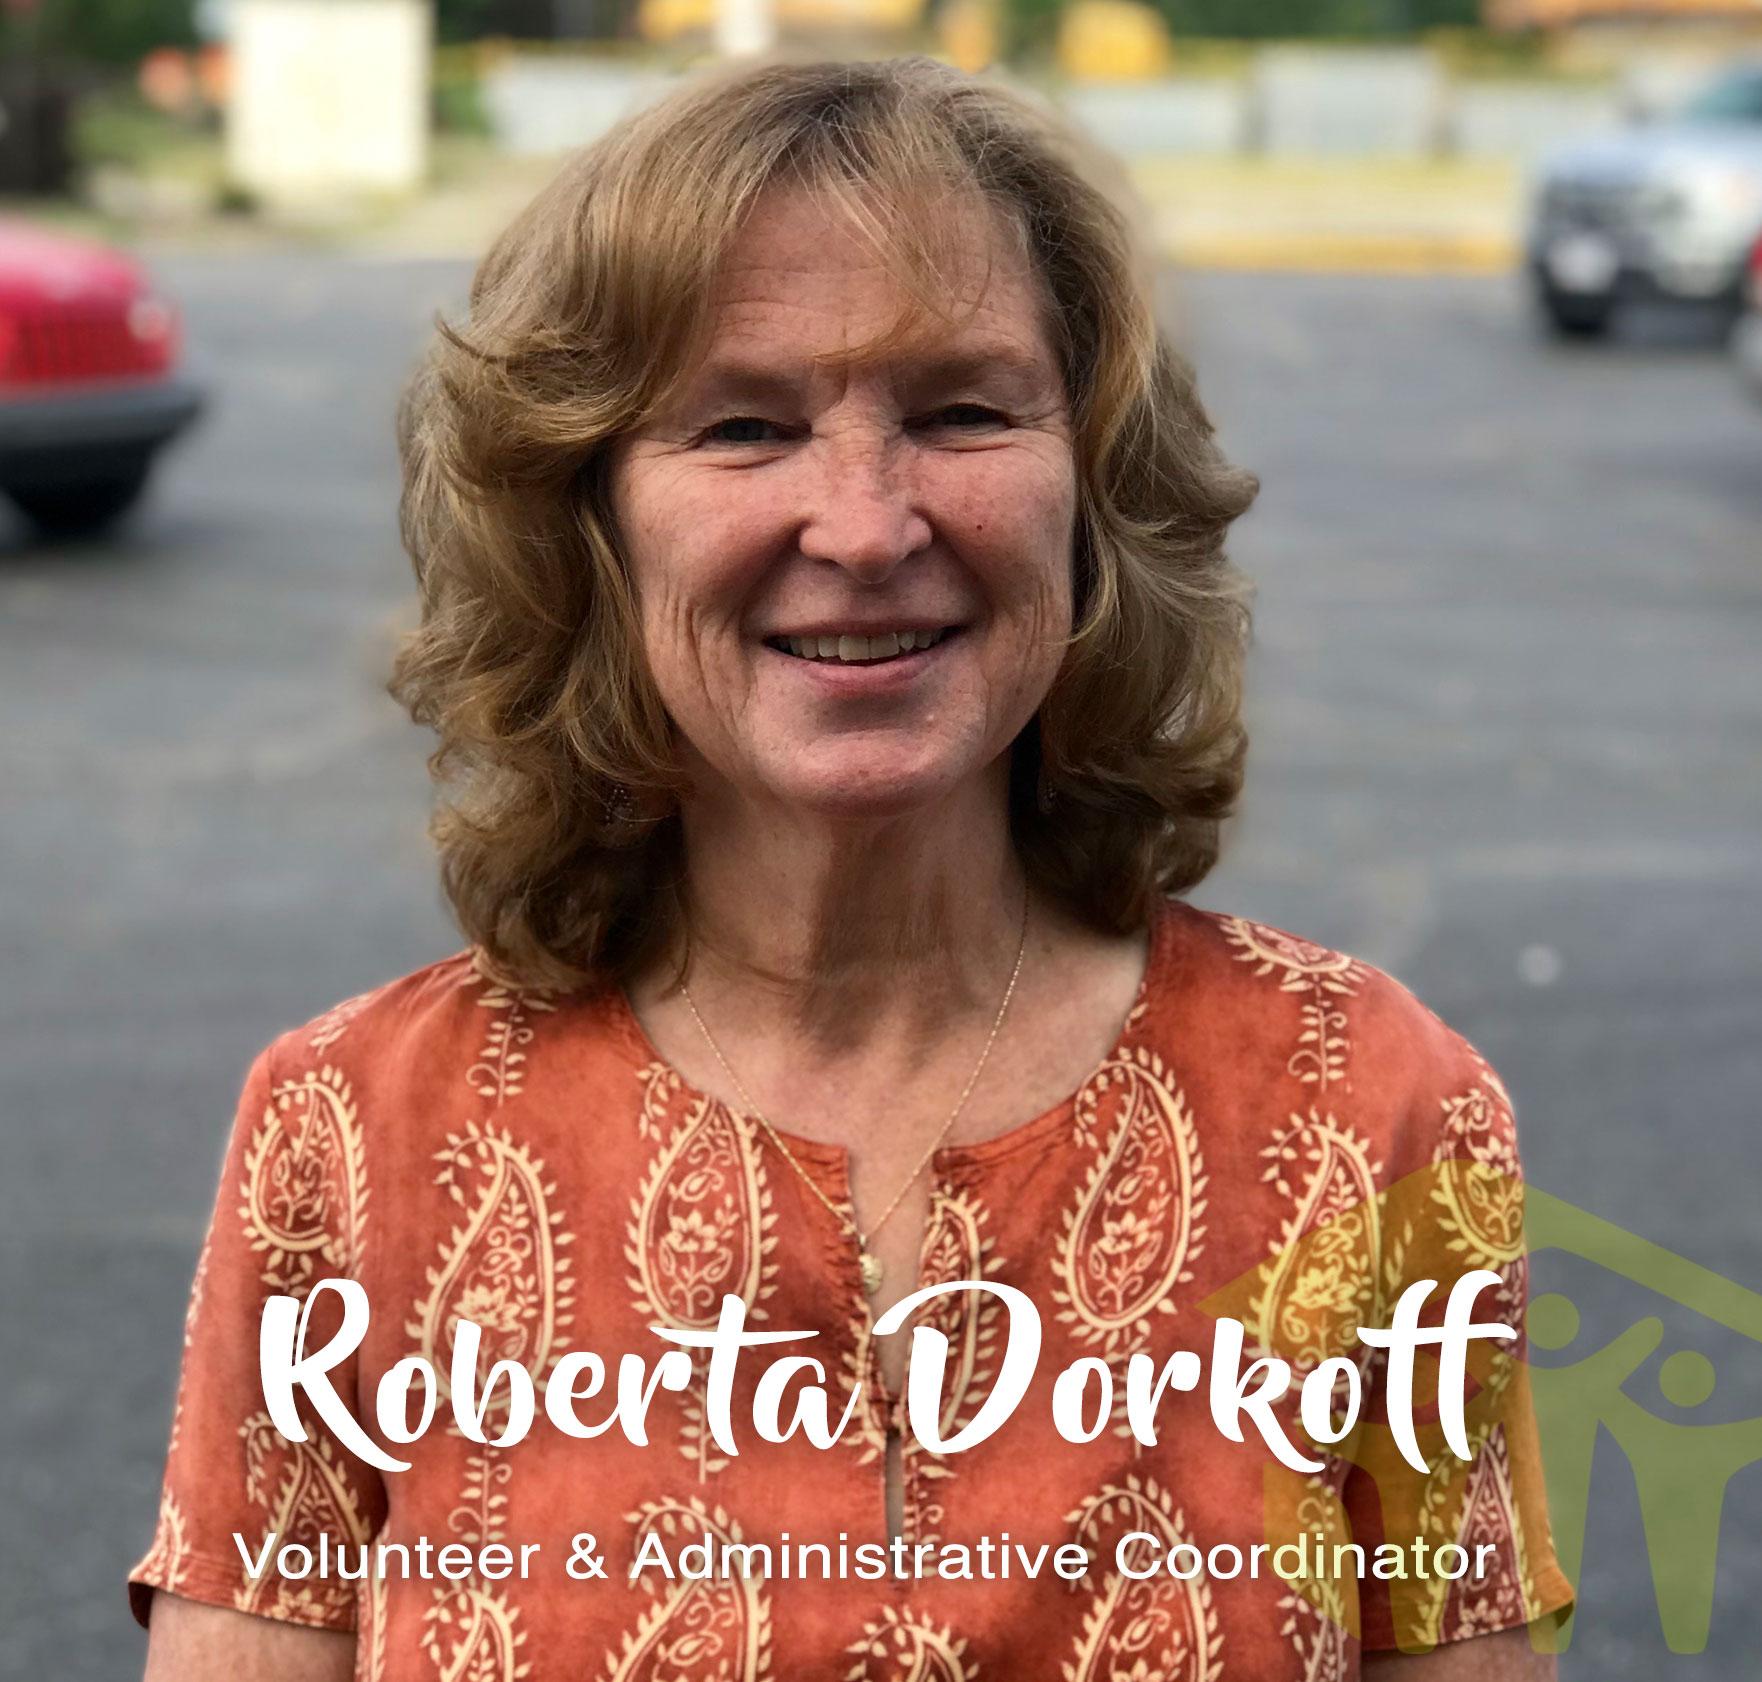 Roberta Dorkoff